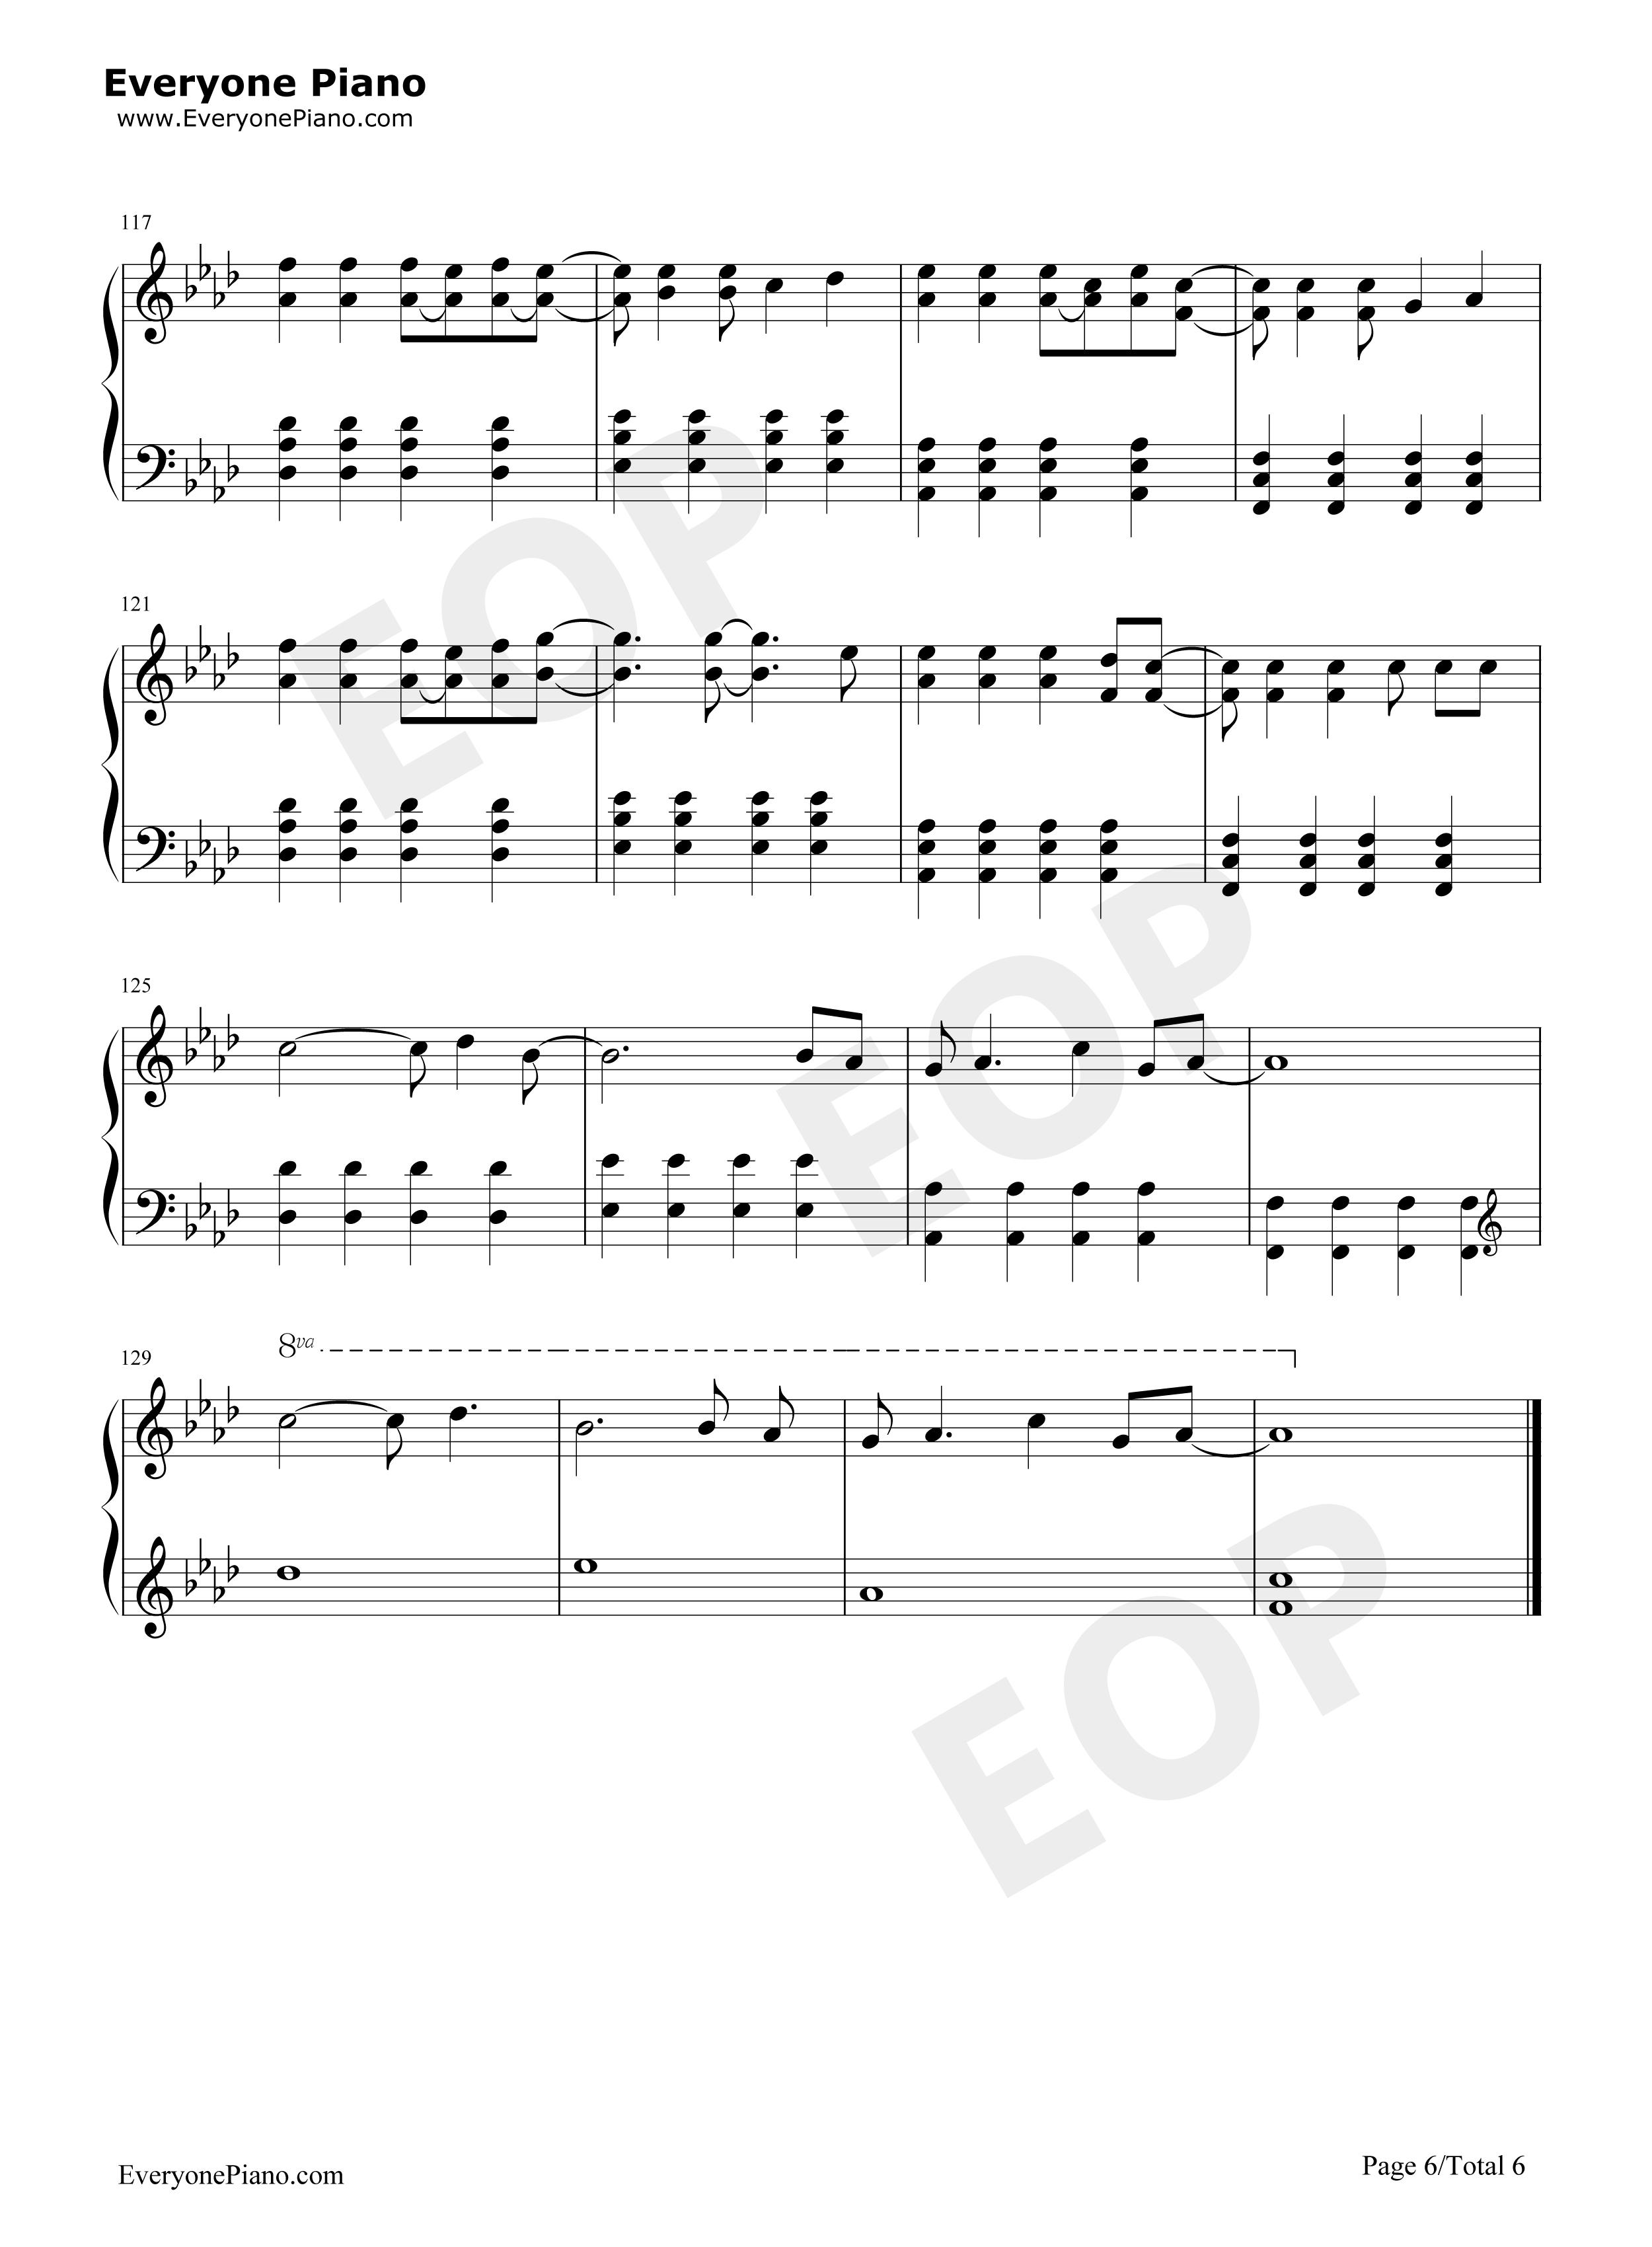 Viva La Vida Chords Viva La Vida Free Piano Sheet Music Piano Chords